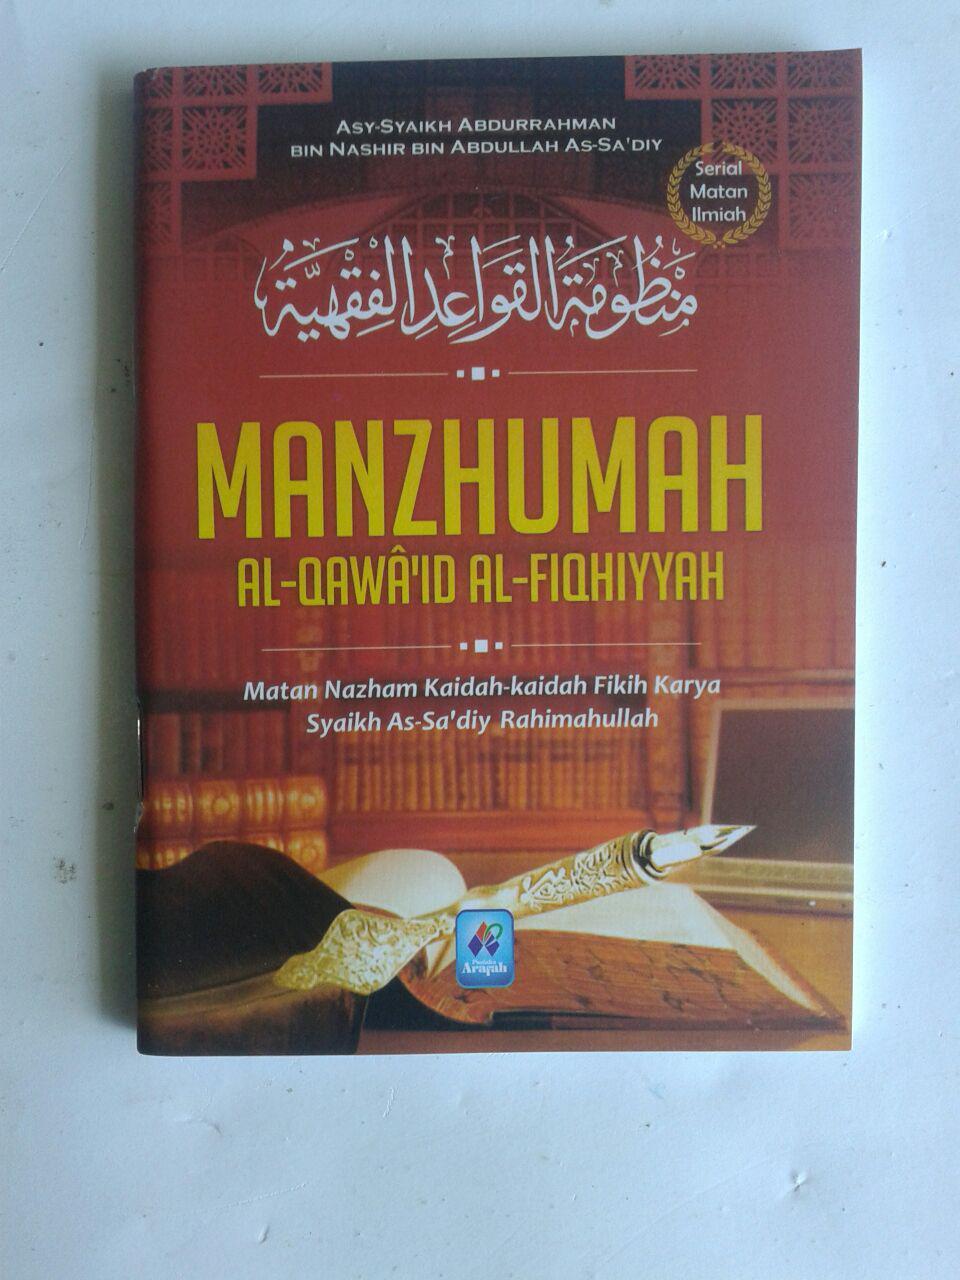 Buku Saku Manzhumah Al-Qawaid Al-Fiqhiyyah As-Sa'diy cover 2